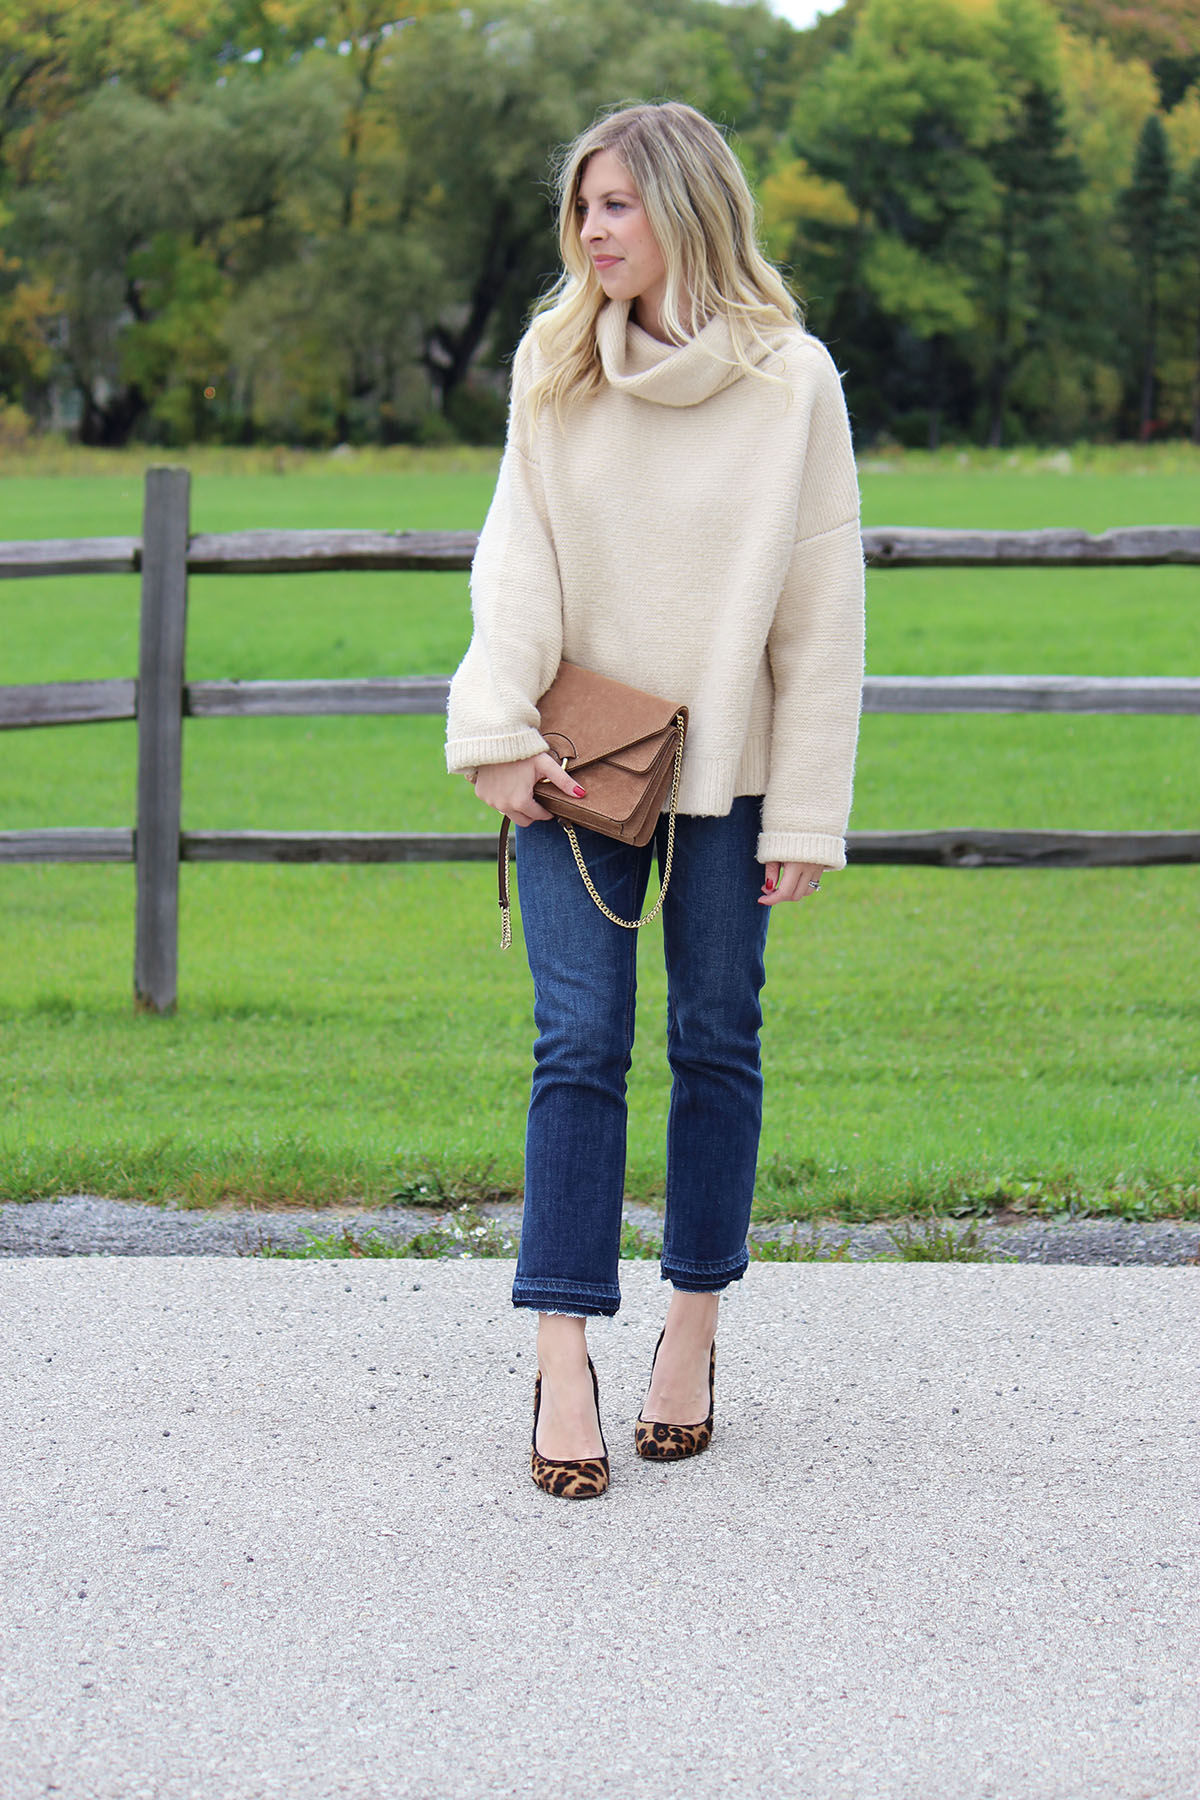 Oversized Turtleneck Sweater with Distressed Denim